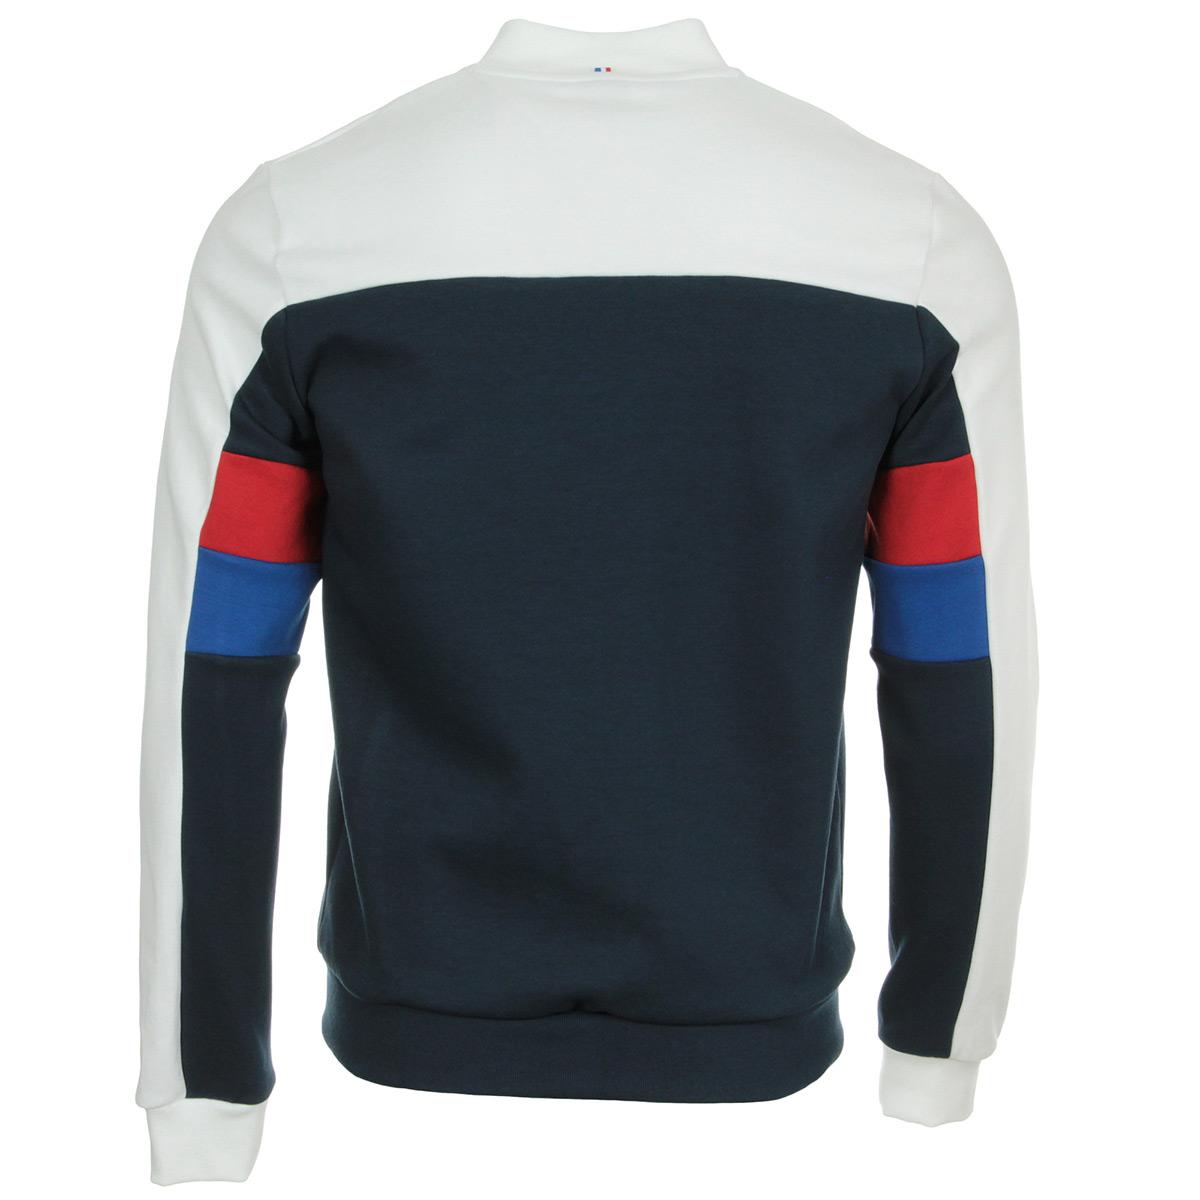 Le Coq Sportif Inspi Football Fz Sweat n°1 1810685, Vestes sport homme